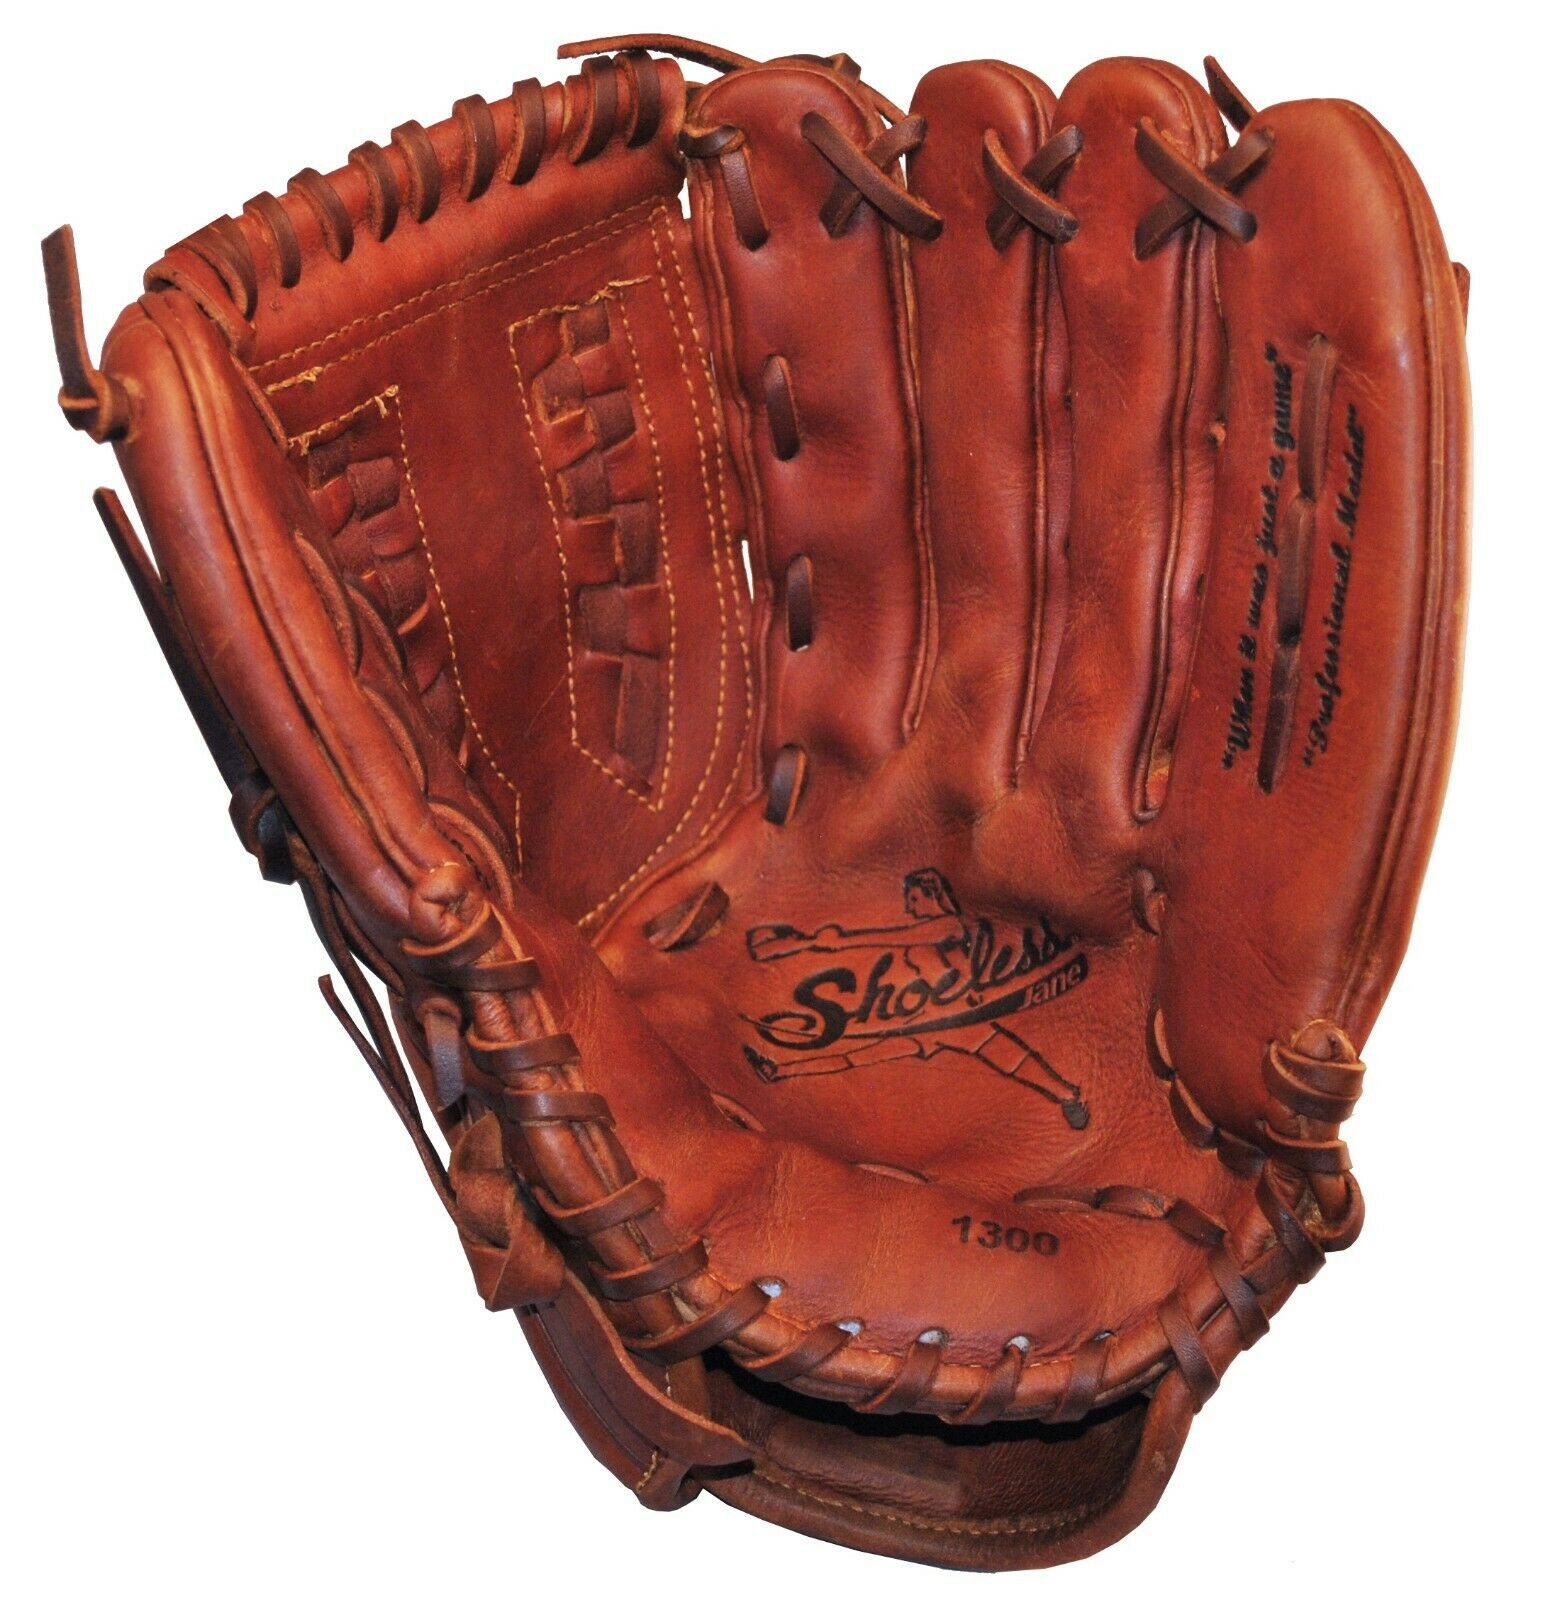 "Shoeless Jane 13/"" Fastpitch Softball Glove 1300FPBW"